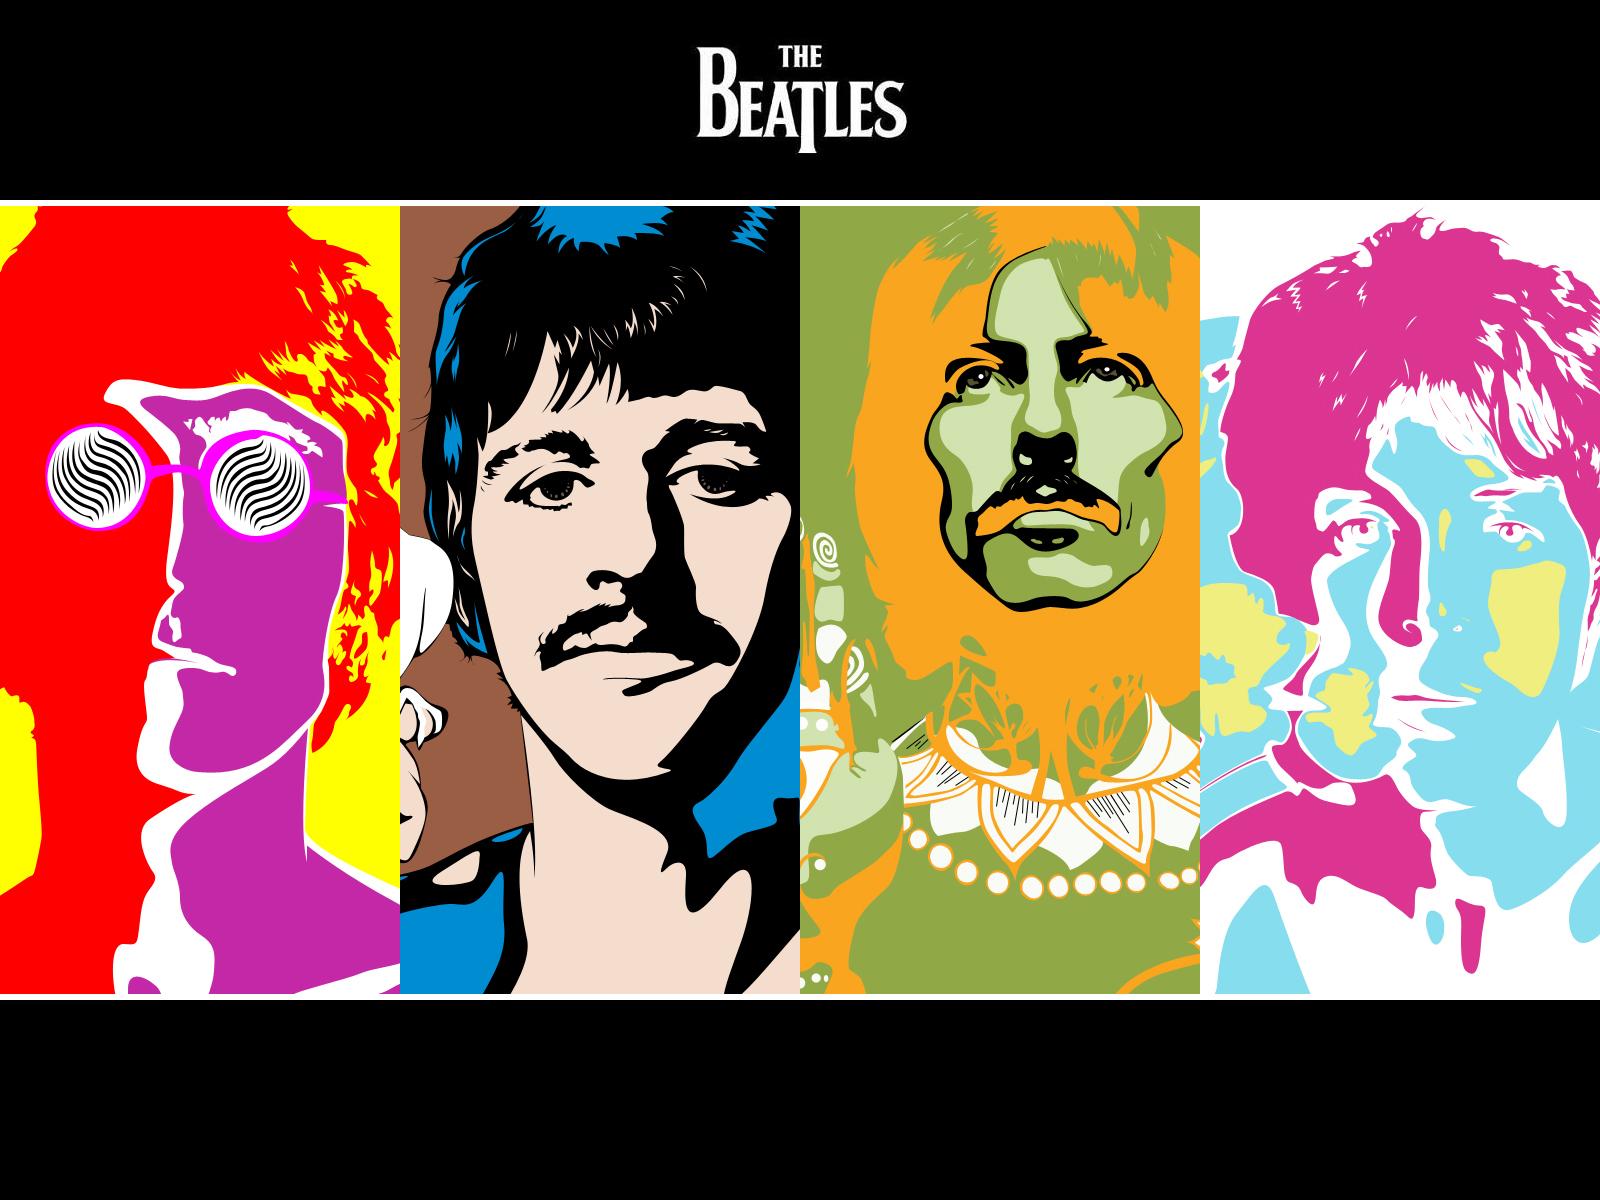 http://4.bp.blogspot.com/_Iy3ZGP8NJ0I/TS_NPWPMUAI/AAAAAAAAACM/_QsYYME8dmY/s1600/Beatles_Wallpaper_by_rmpugliese.jpg